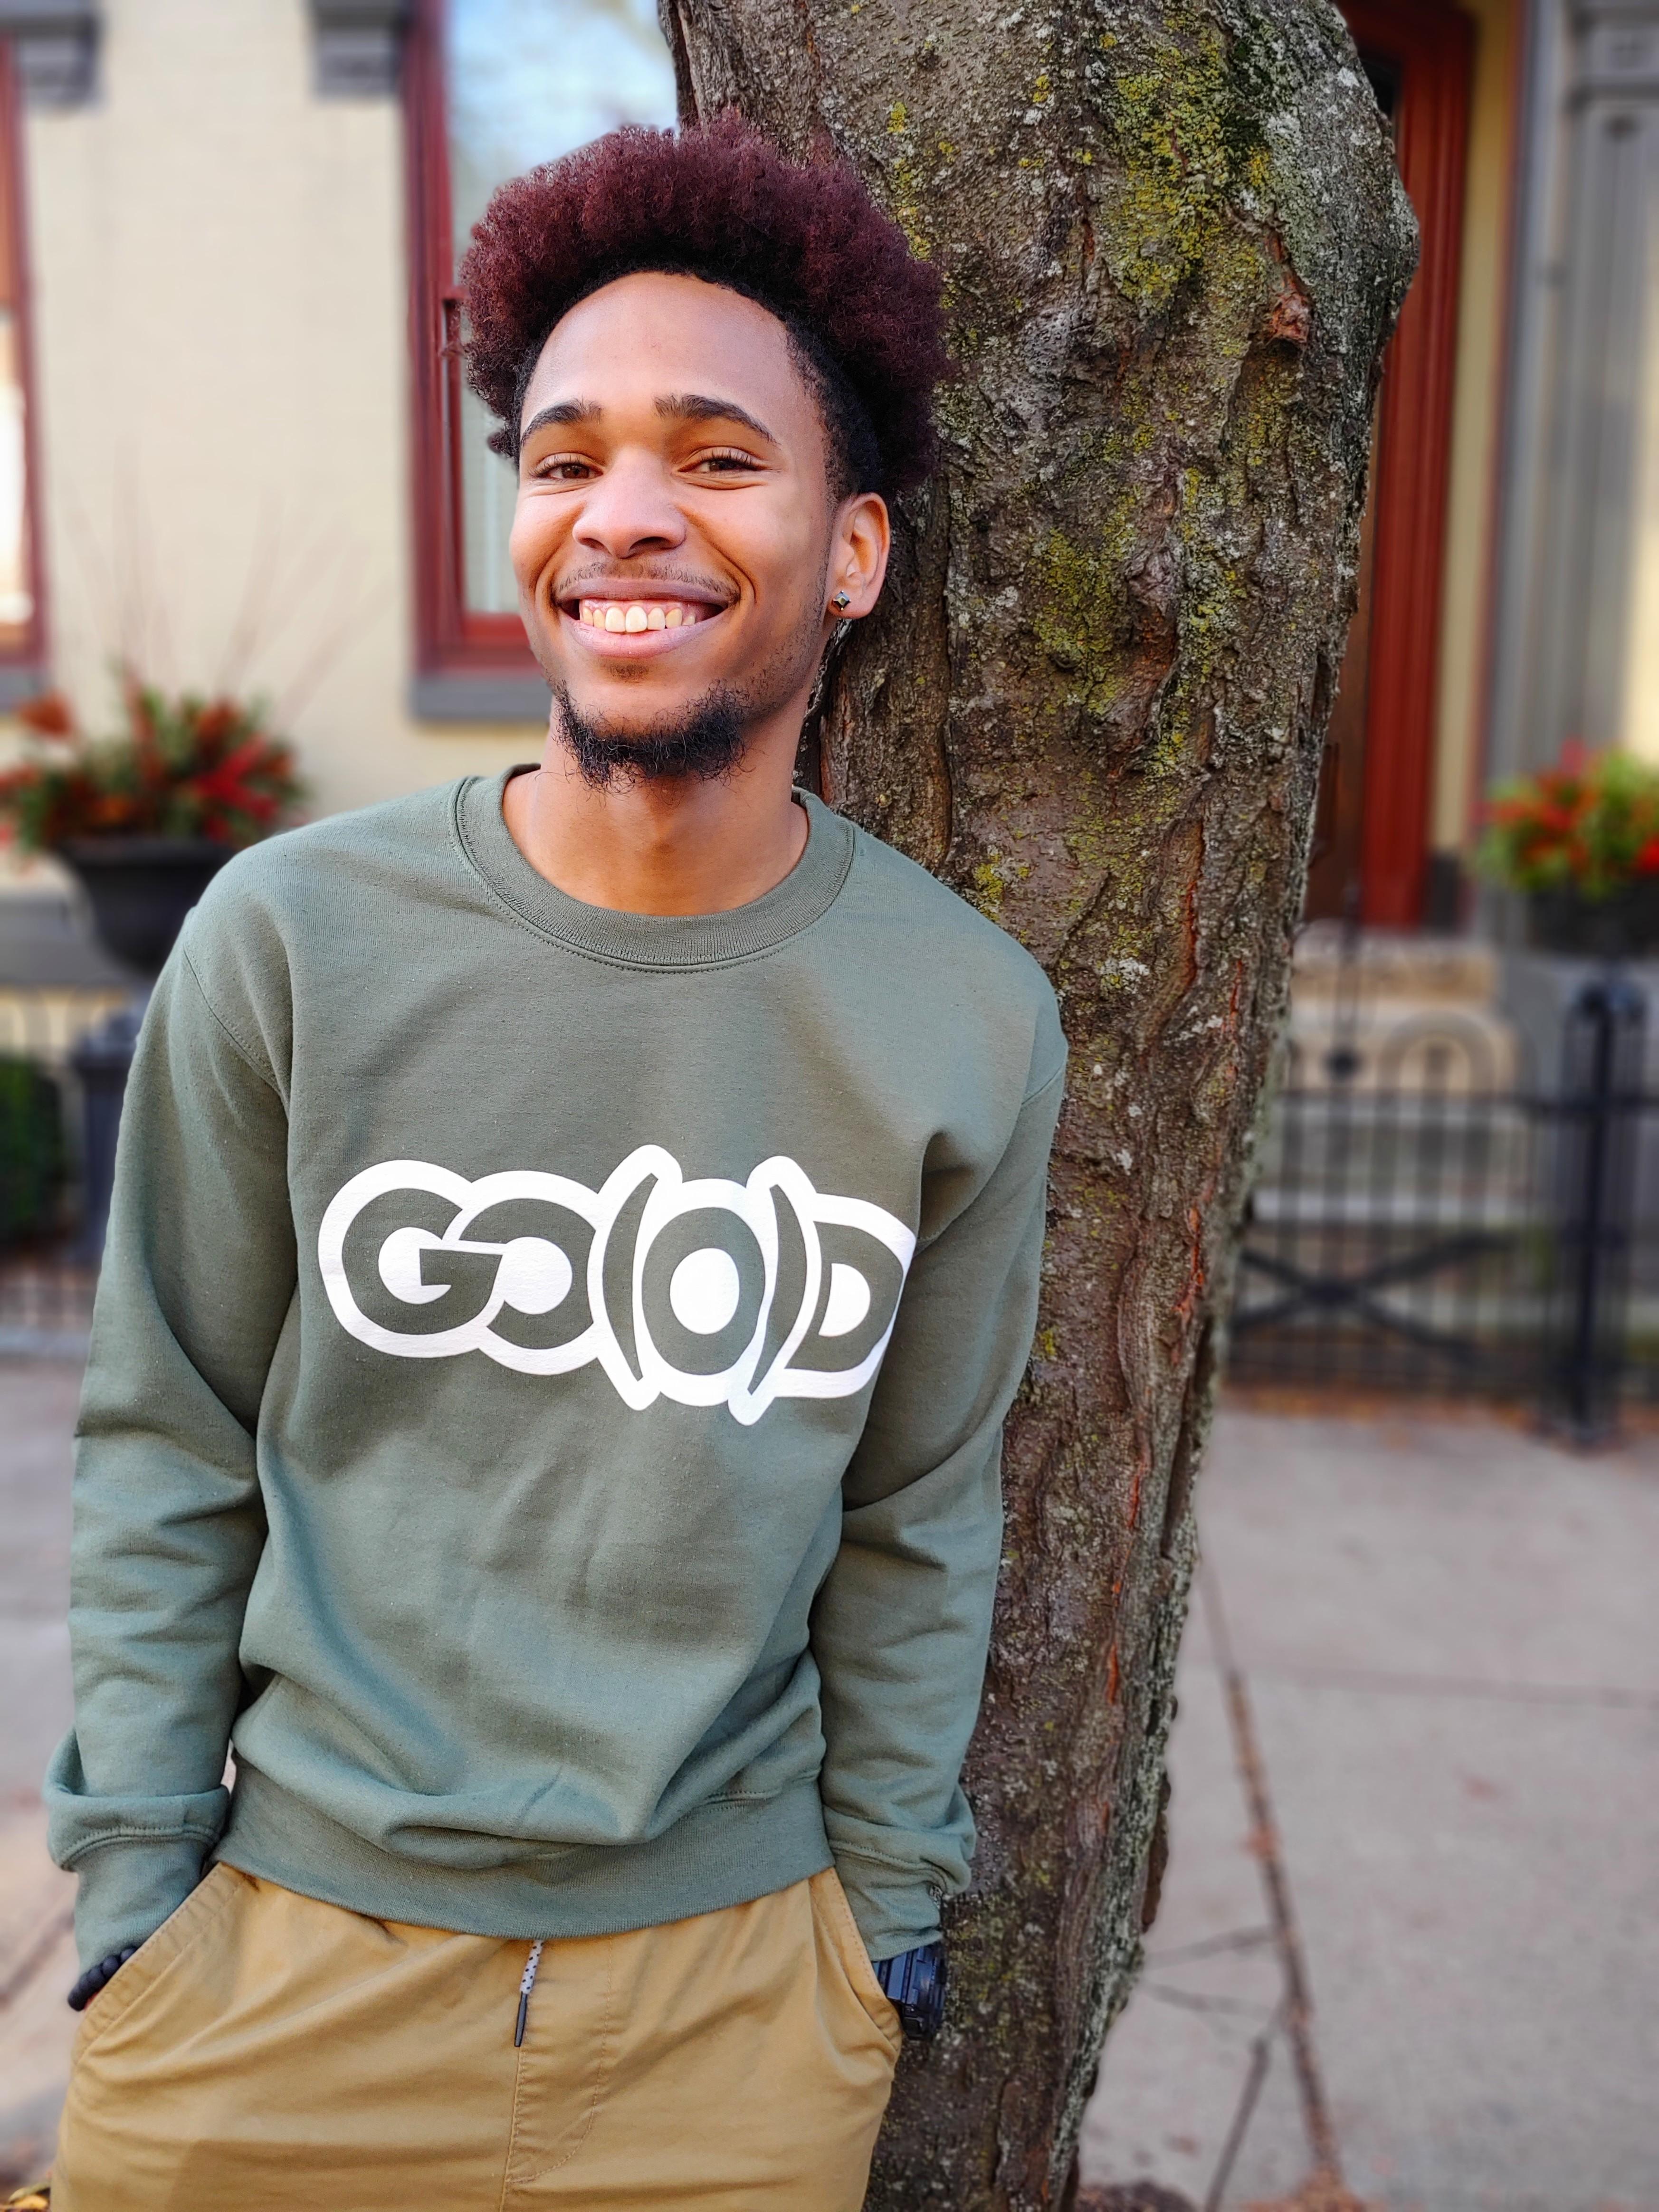 GO(O)D Sweatshirt-military green 00188